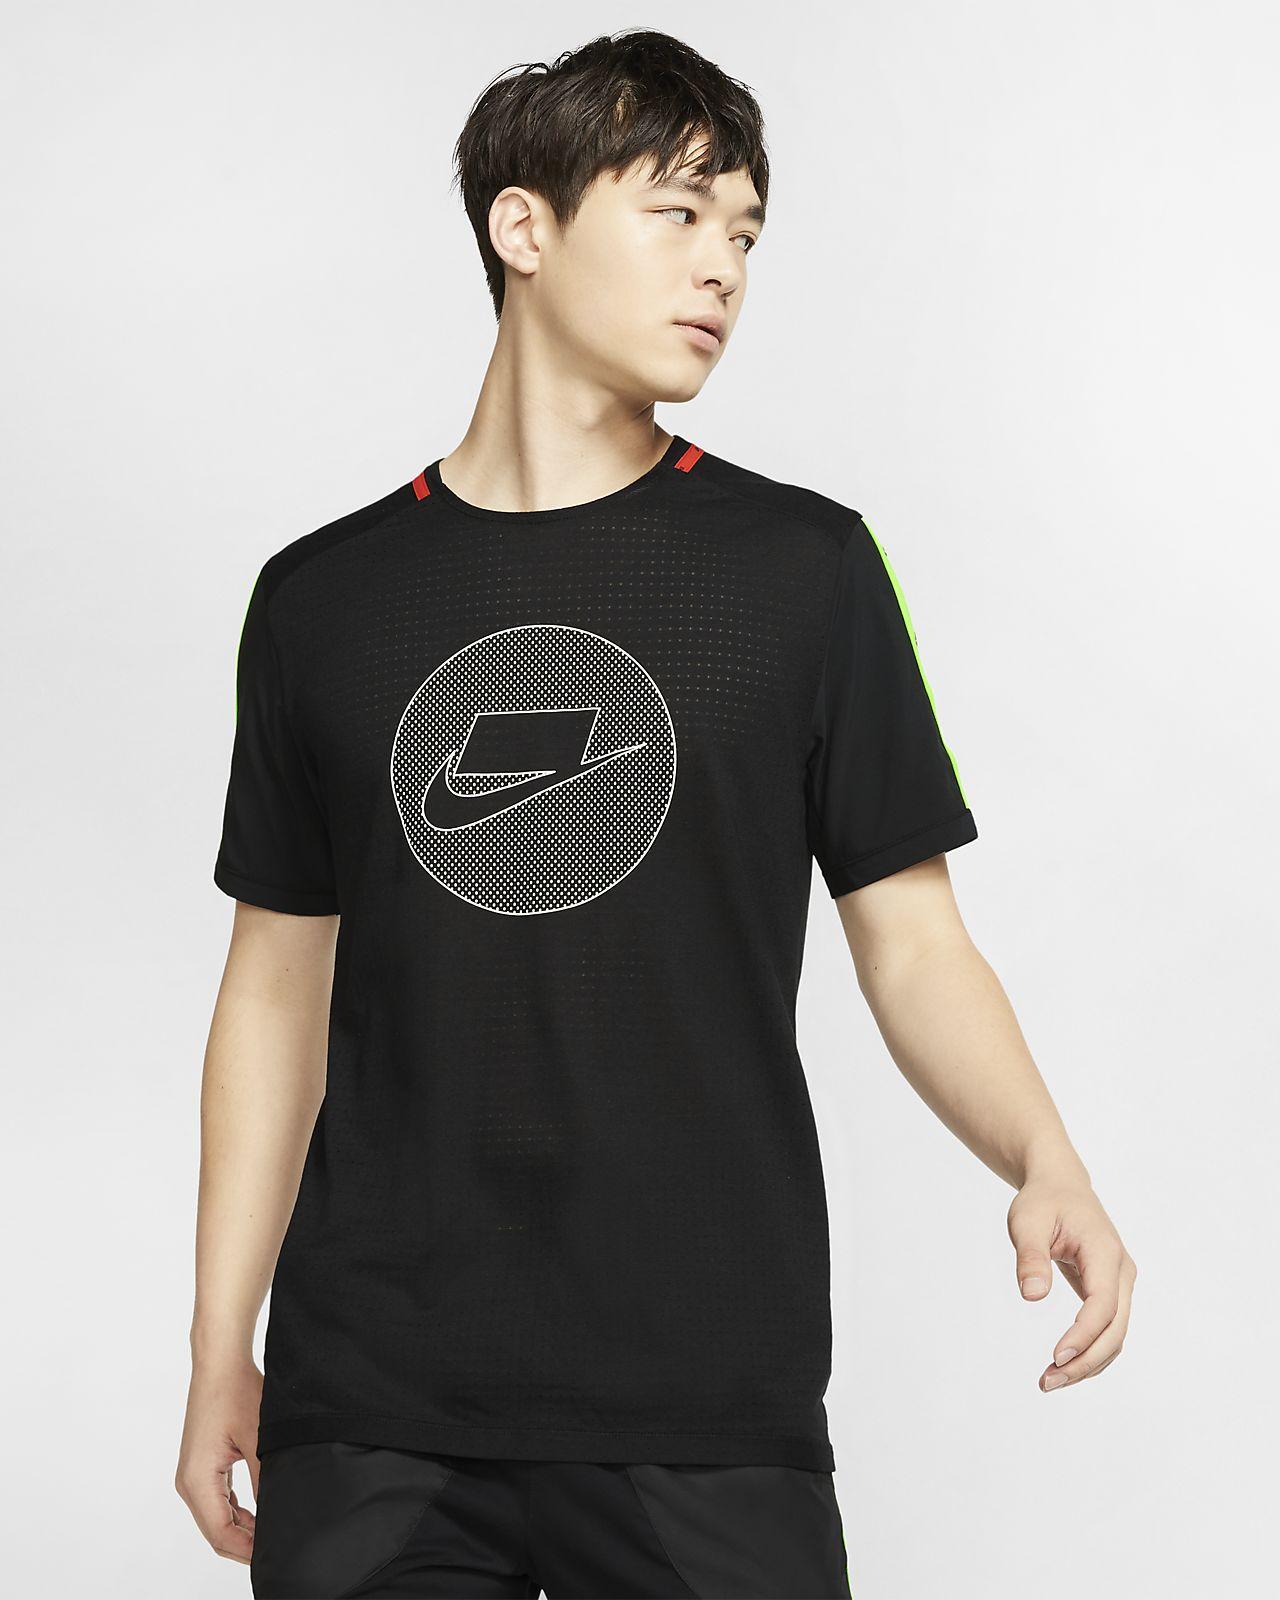 Prenda para la parte superior de running de manga corta para hombre Nike